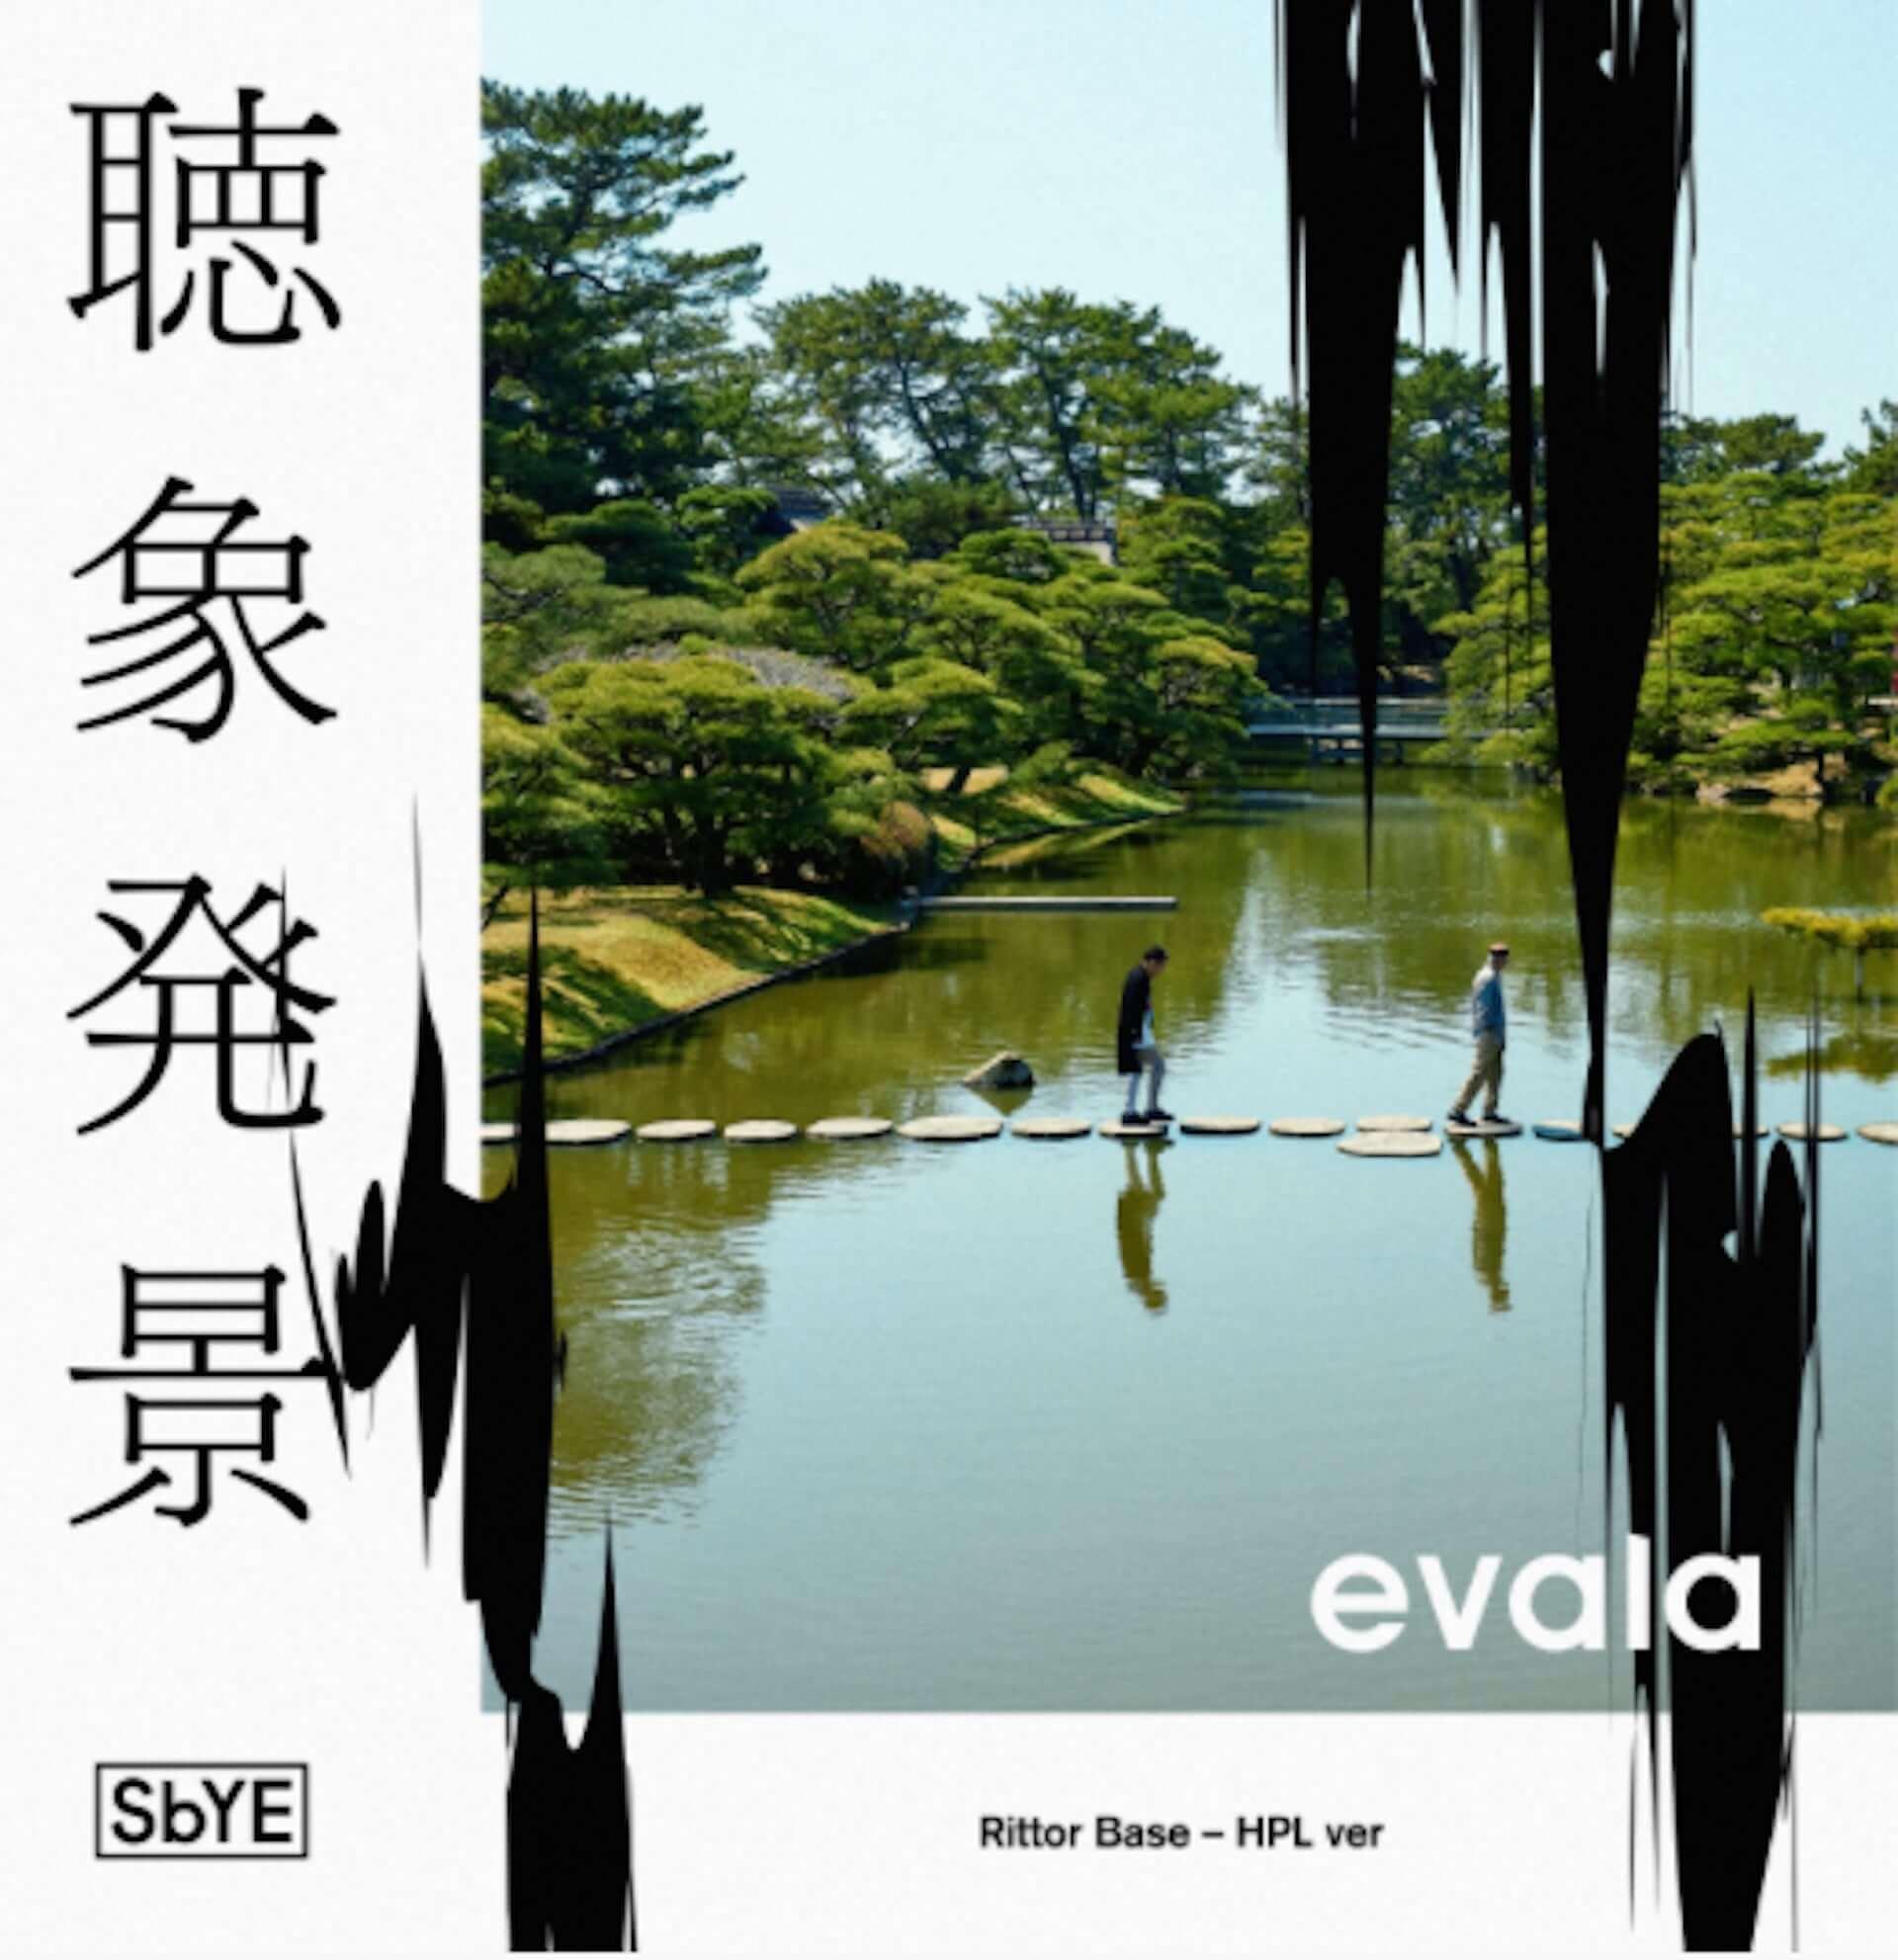 evala、約10年振りの音源『聴象発景 in Rittor Base - HPL ver』をリリース!サウンドインスタレーションの立体音響をヘッドフォン向けに再現 music210128_evala_1-1920x1983